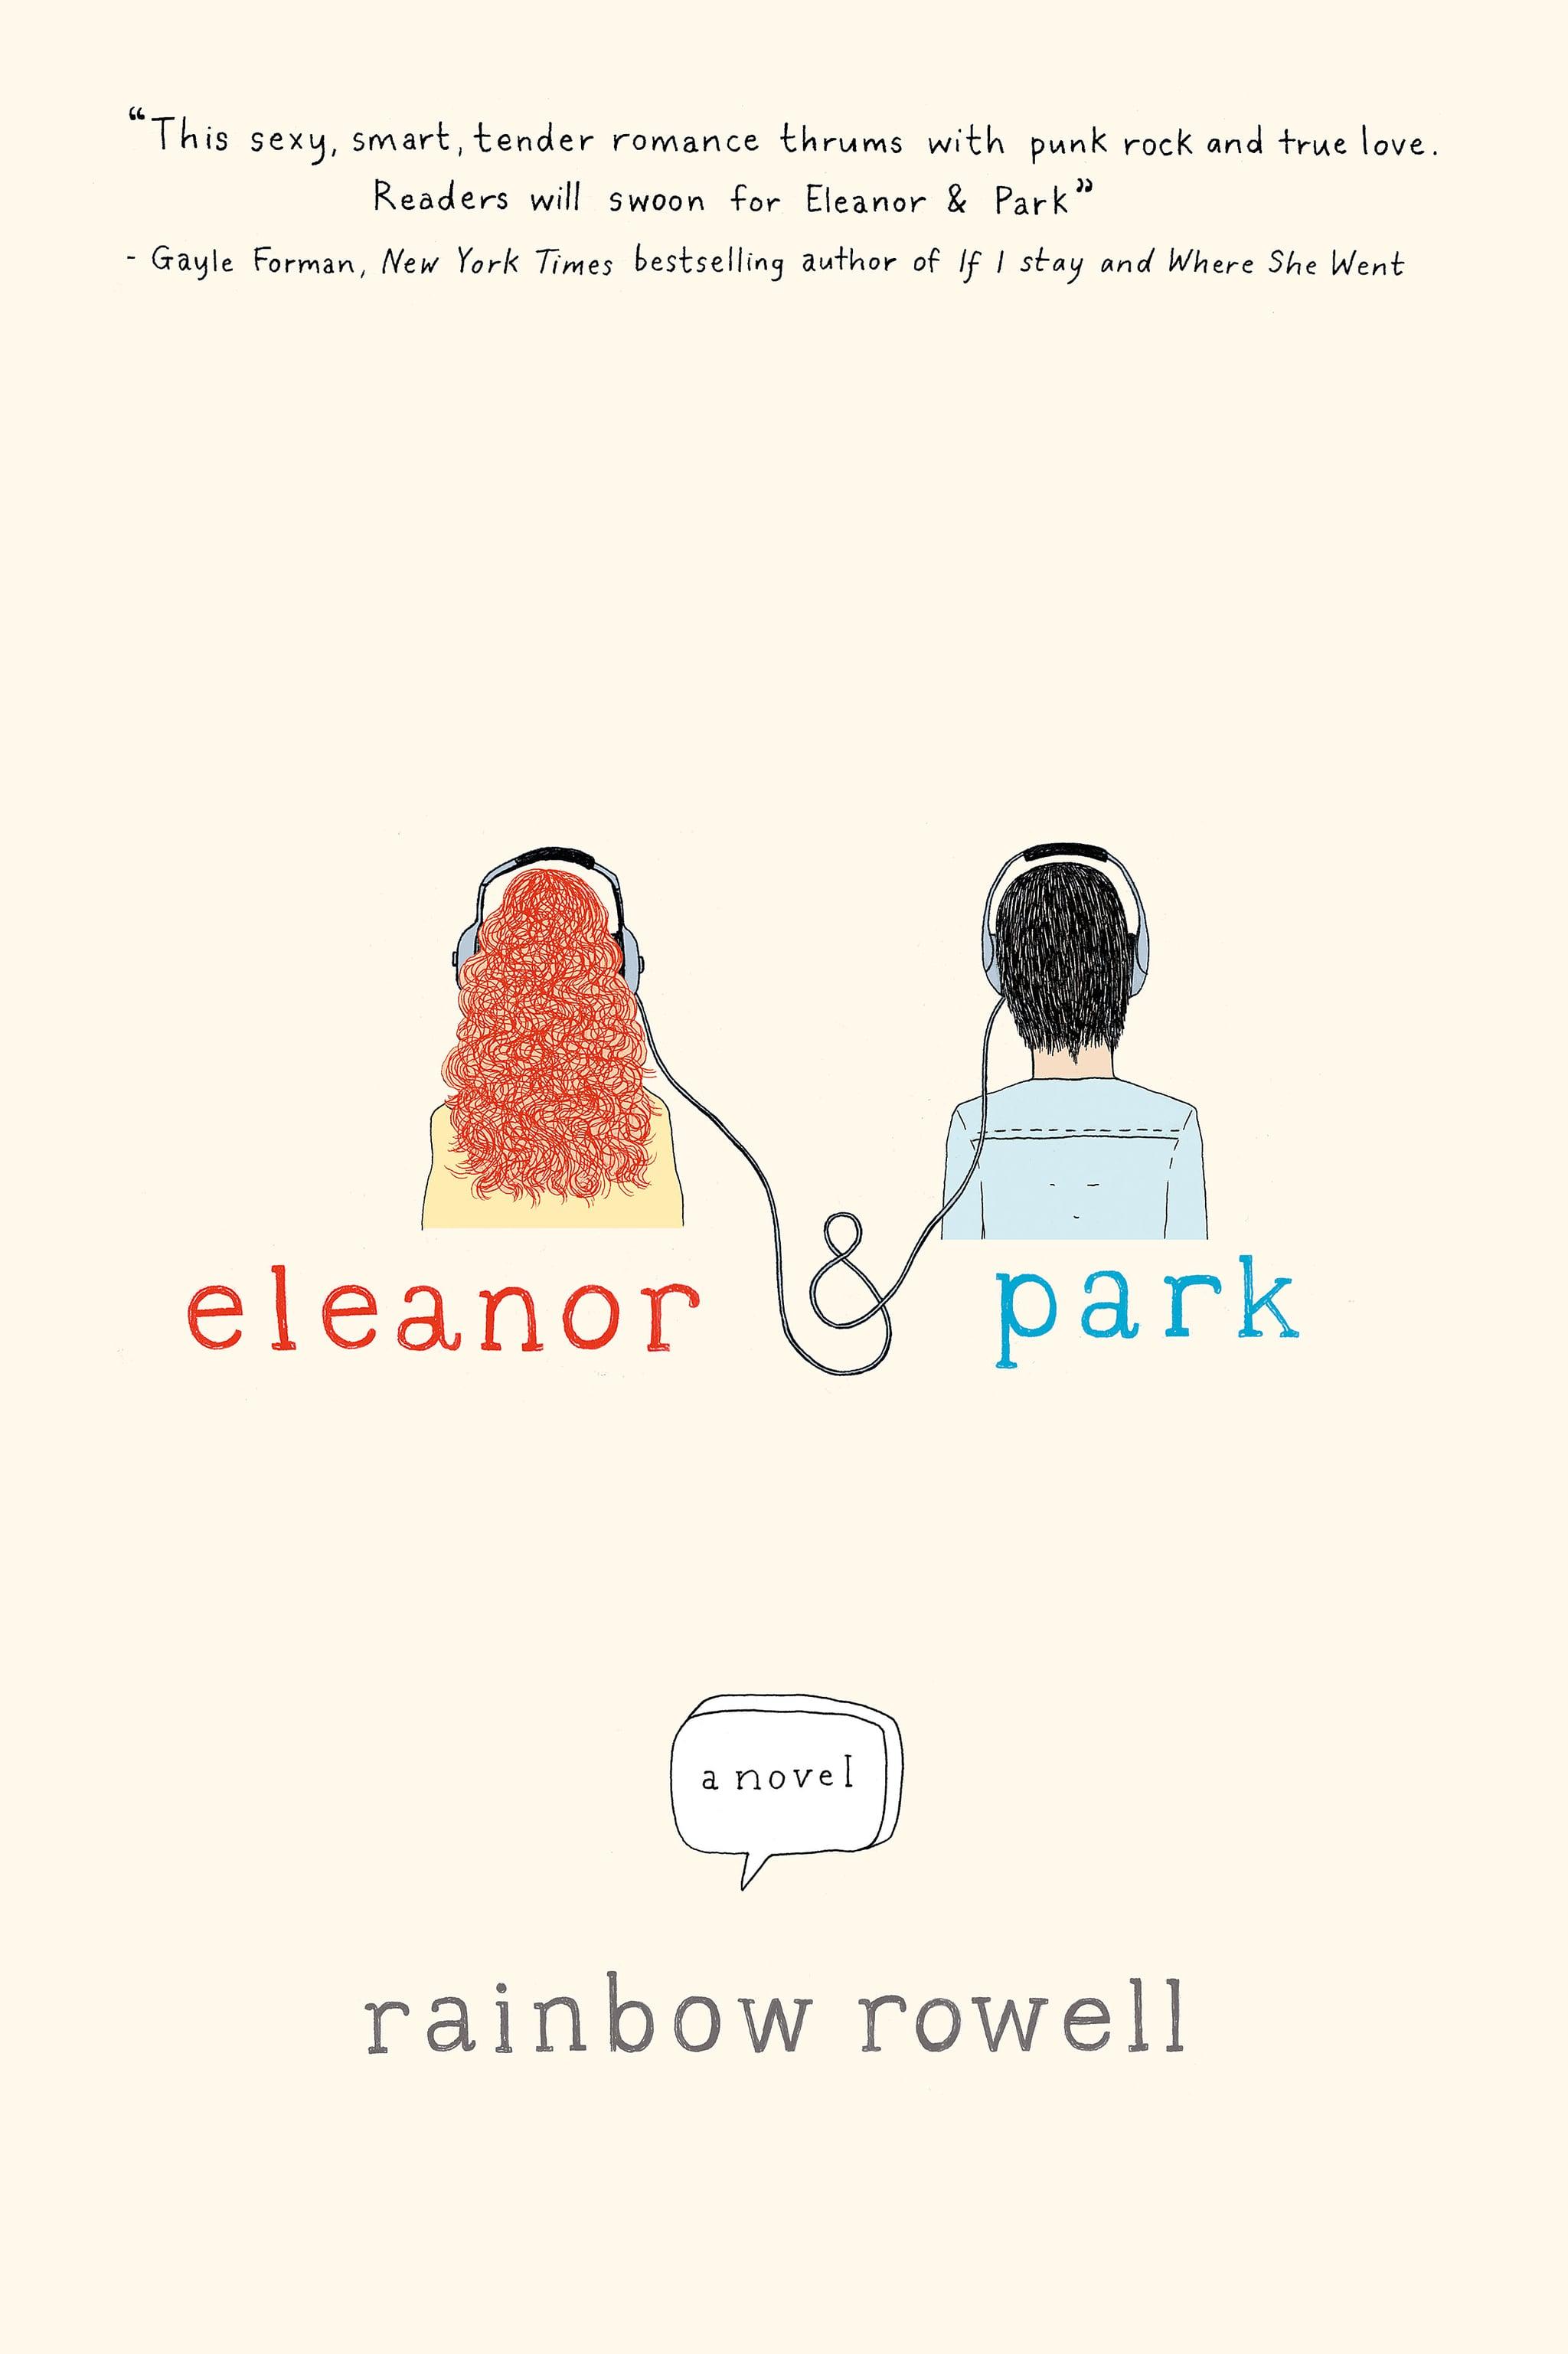 Nebraska: Eleanor & Park by Rainbow Rowell